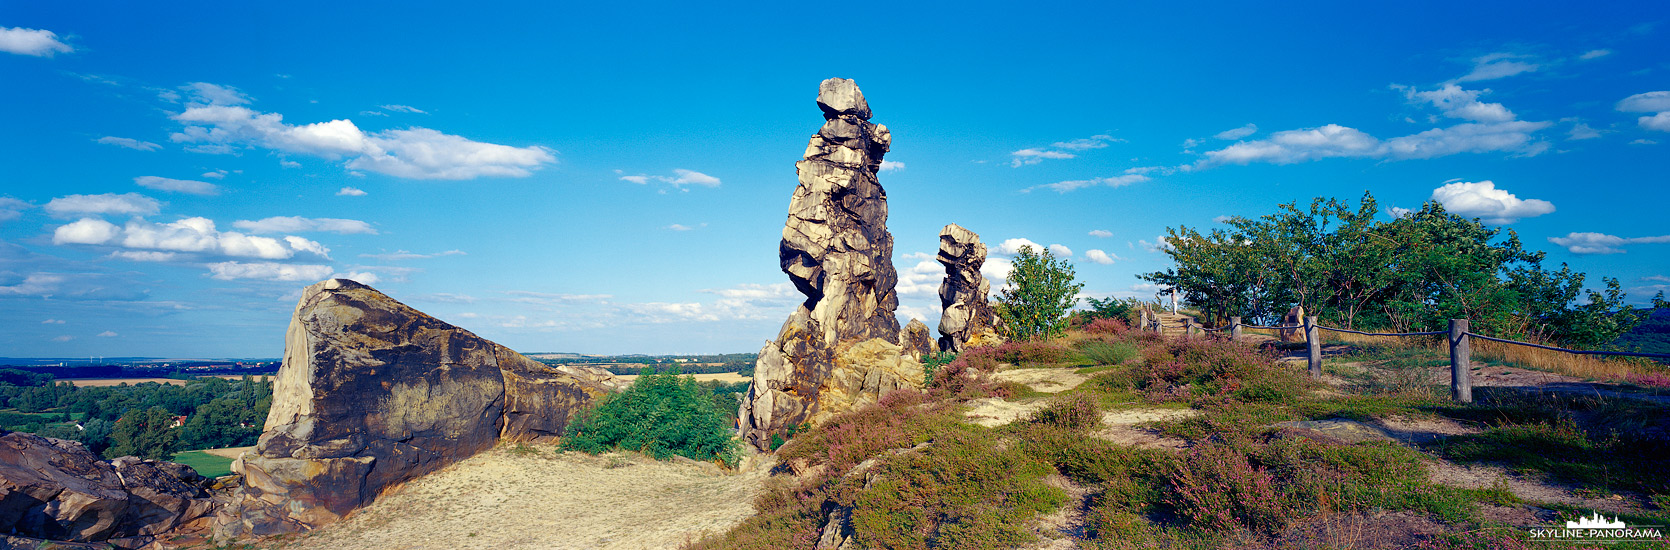 Teufelsmauer – Harz Panorama (p_01040)